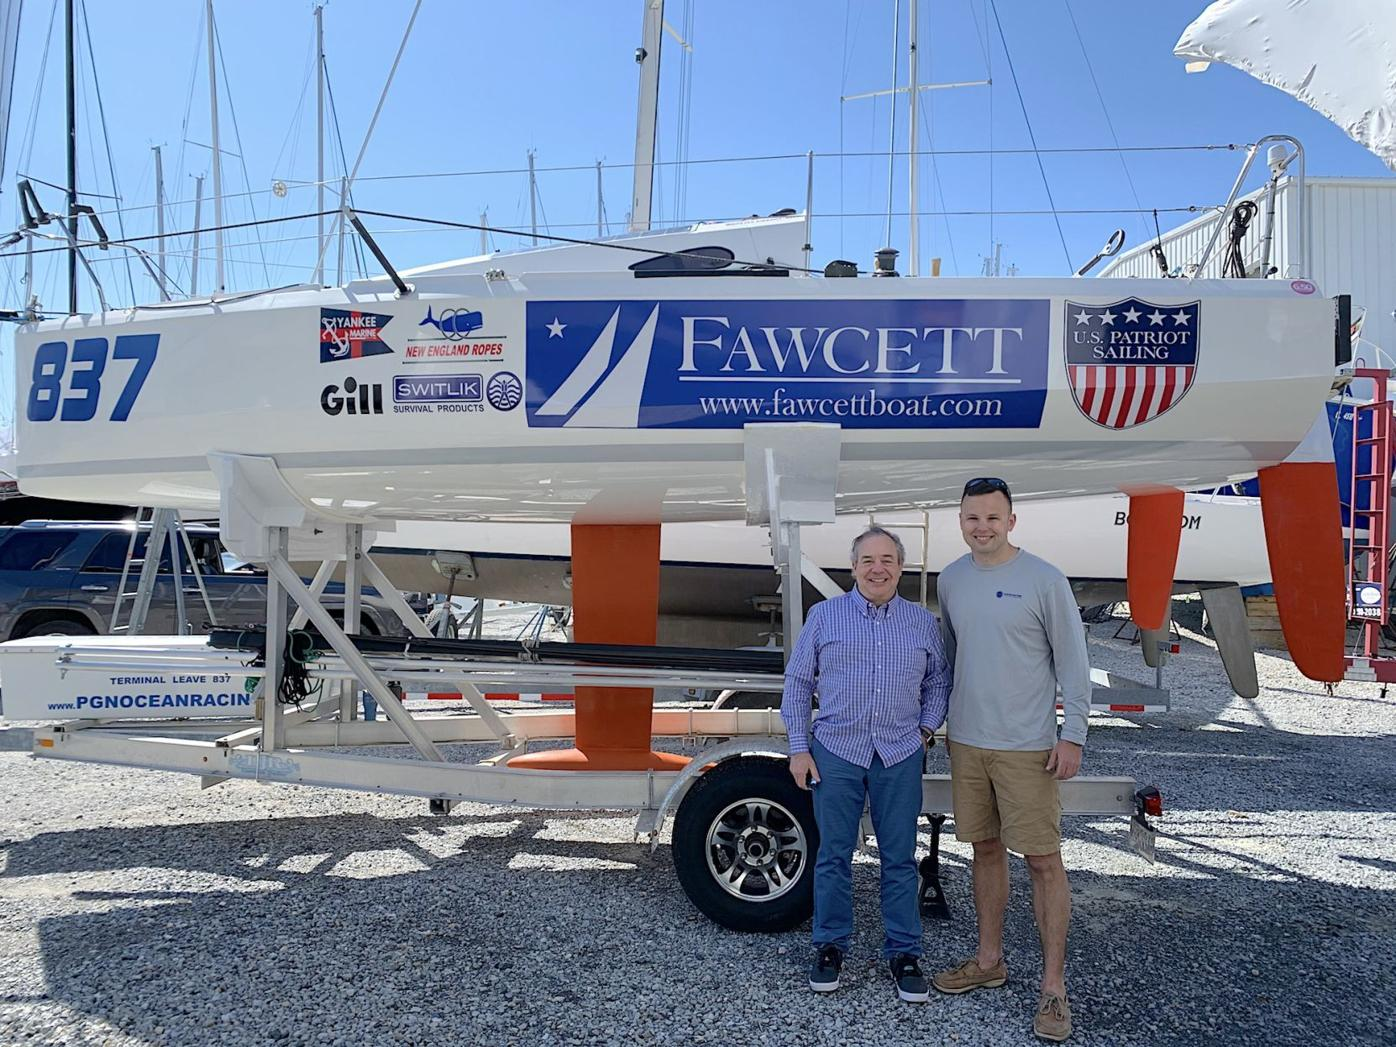 U.S. Marine set to sail across Atlantic